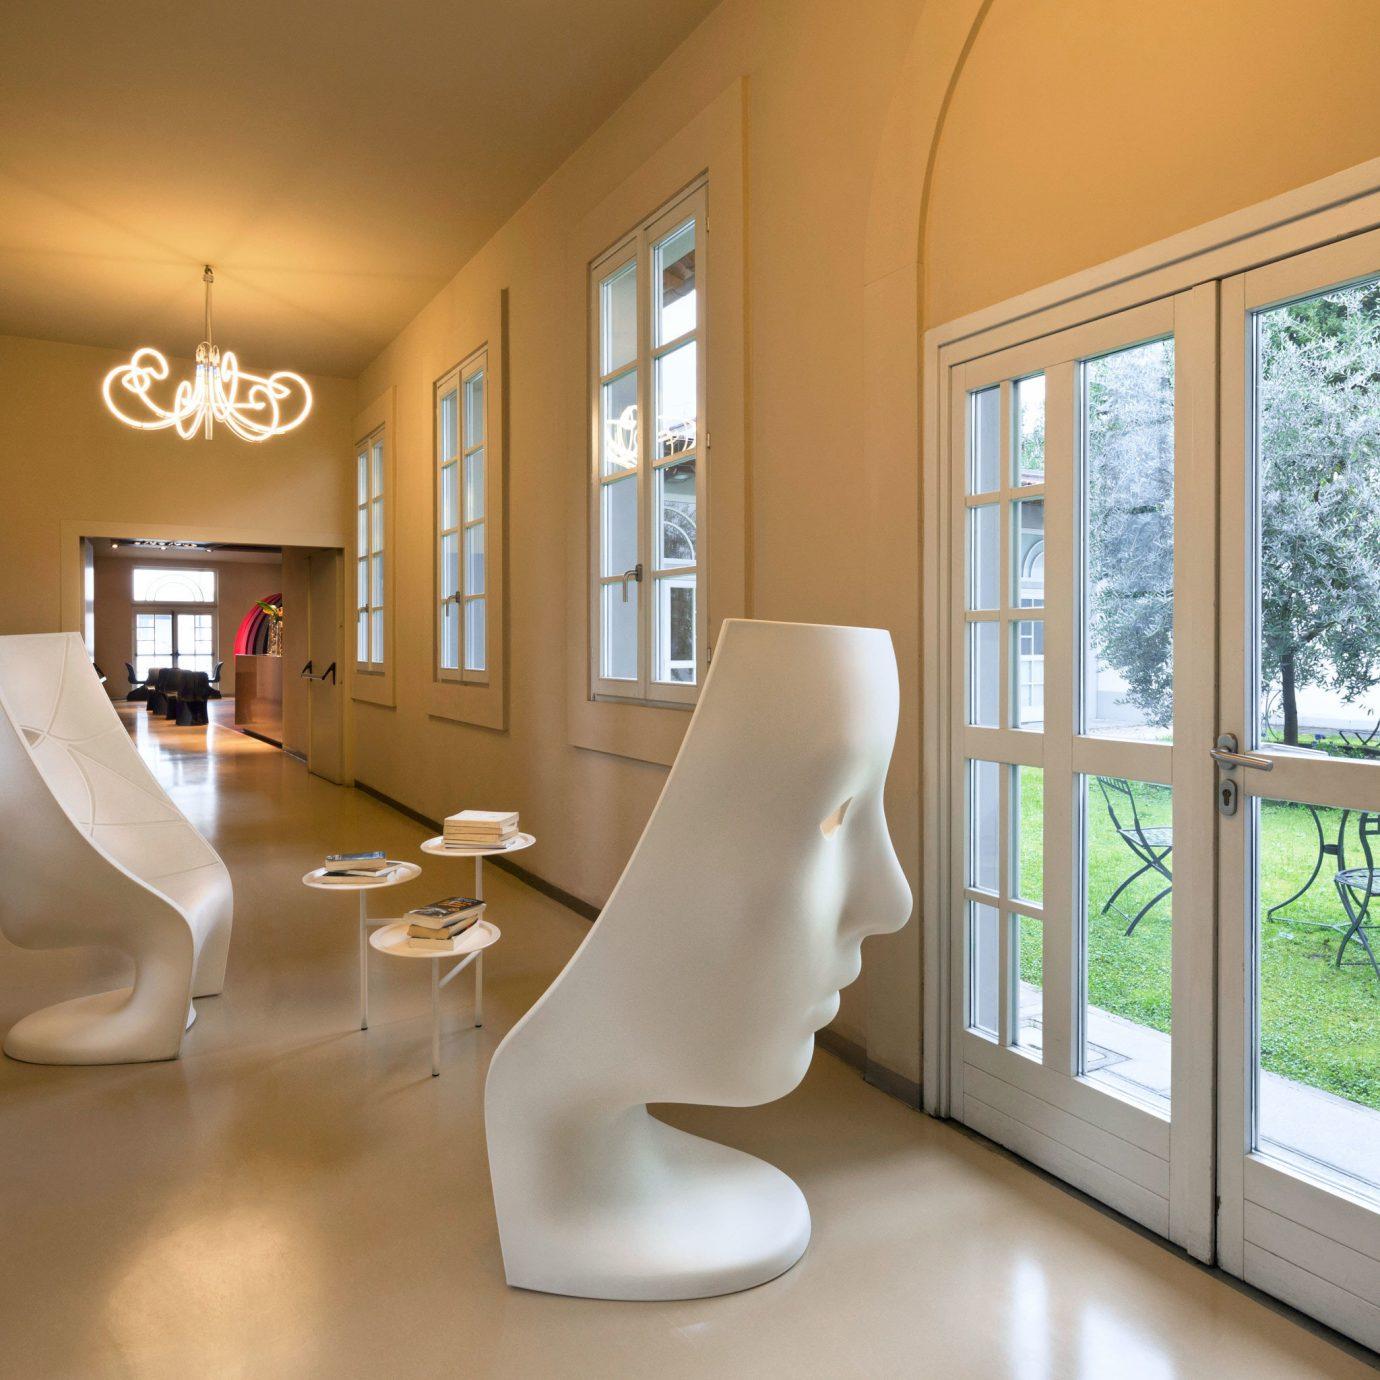 Florence Hip Hotels Italy Lounge property living room home hardwood flooring Modern